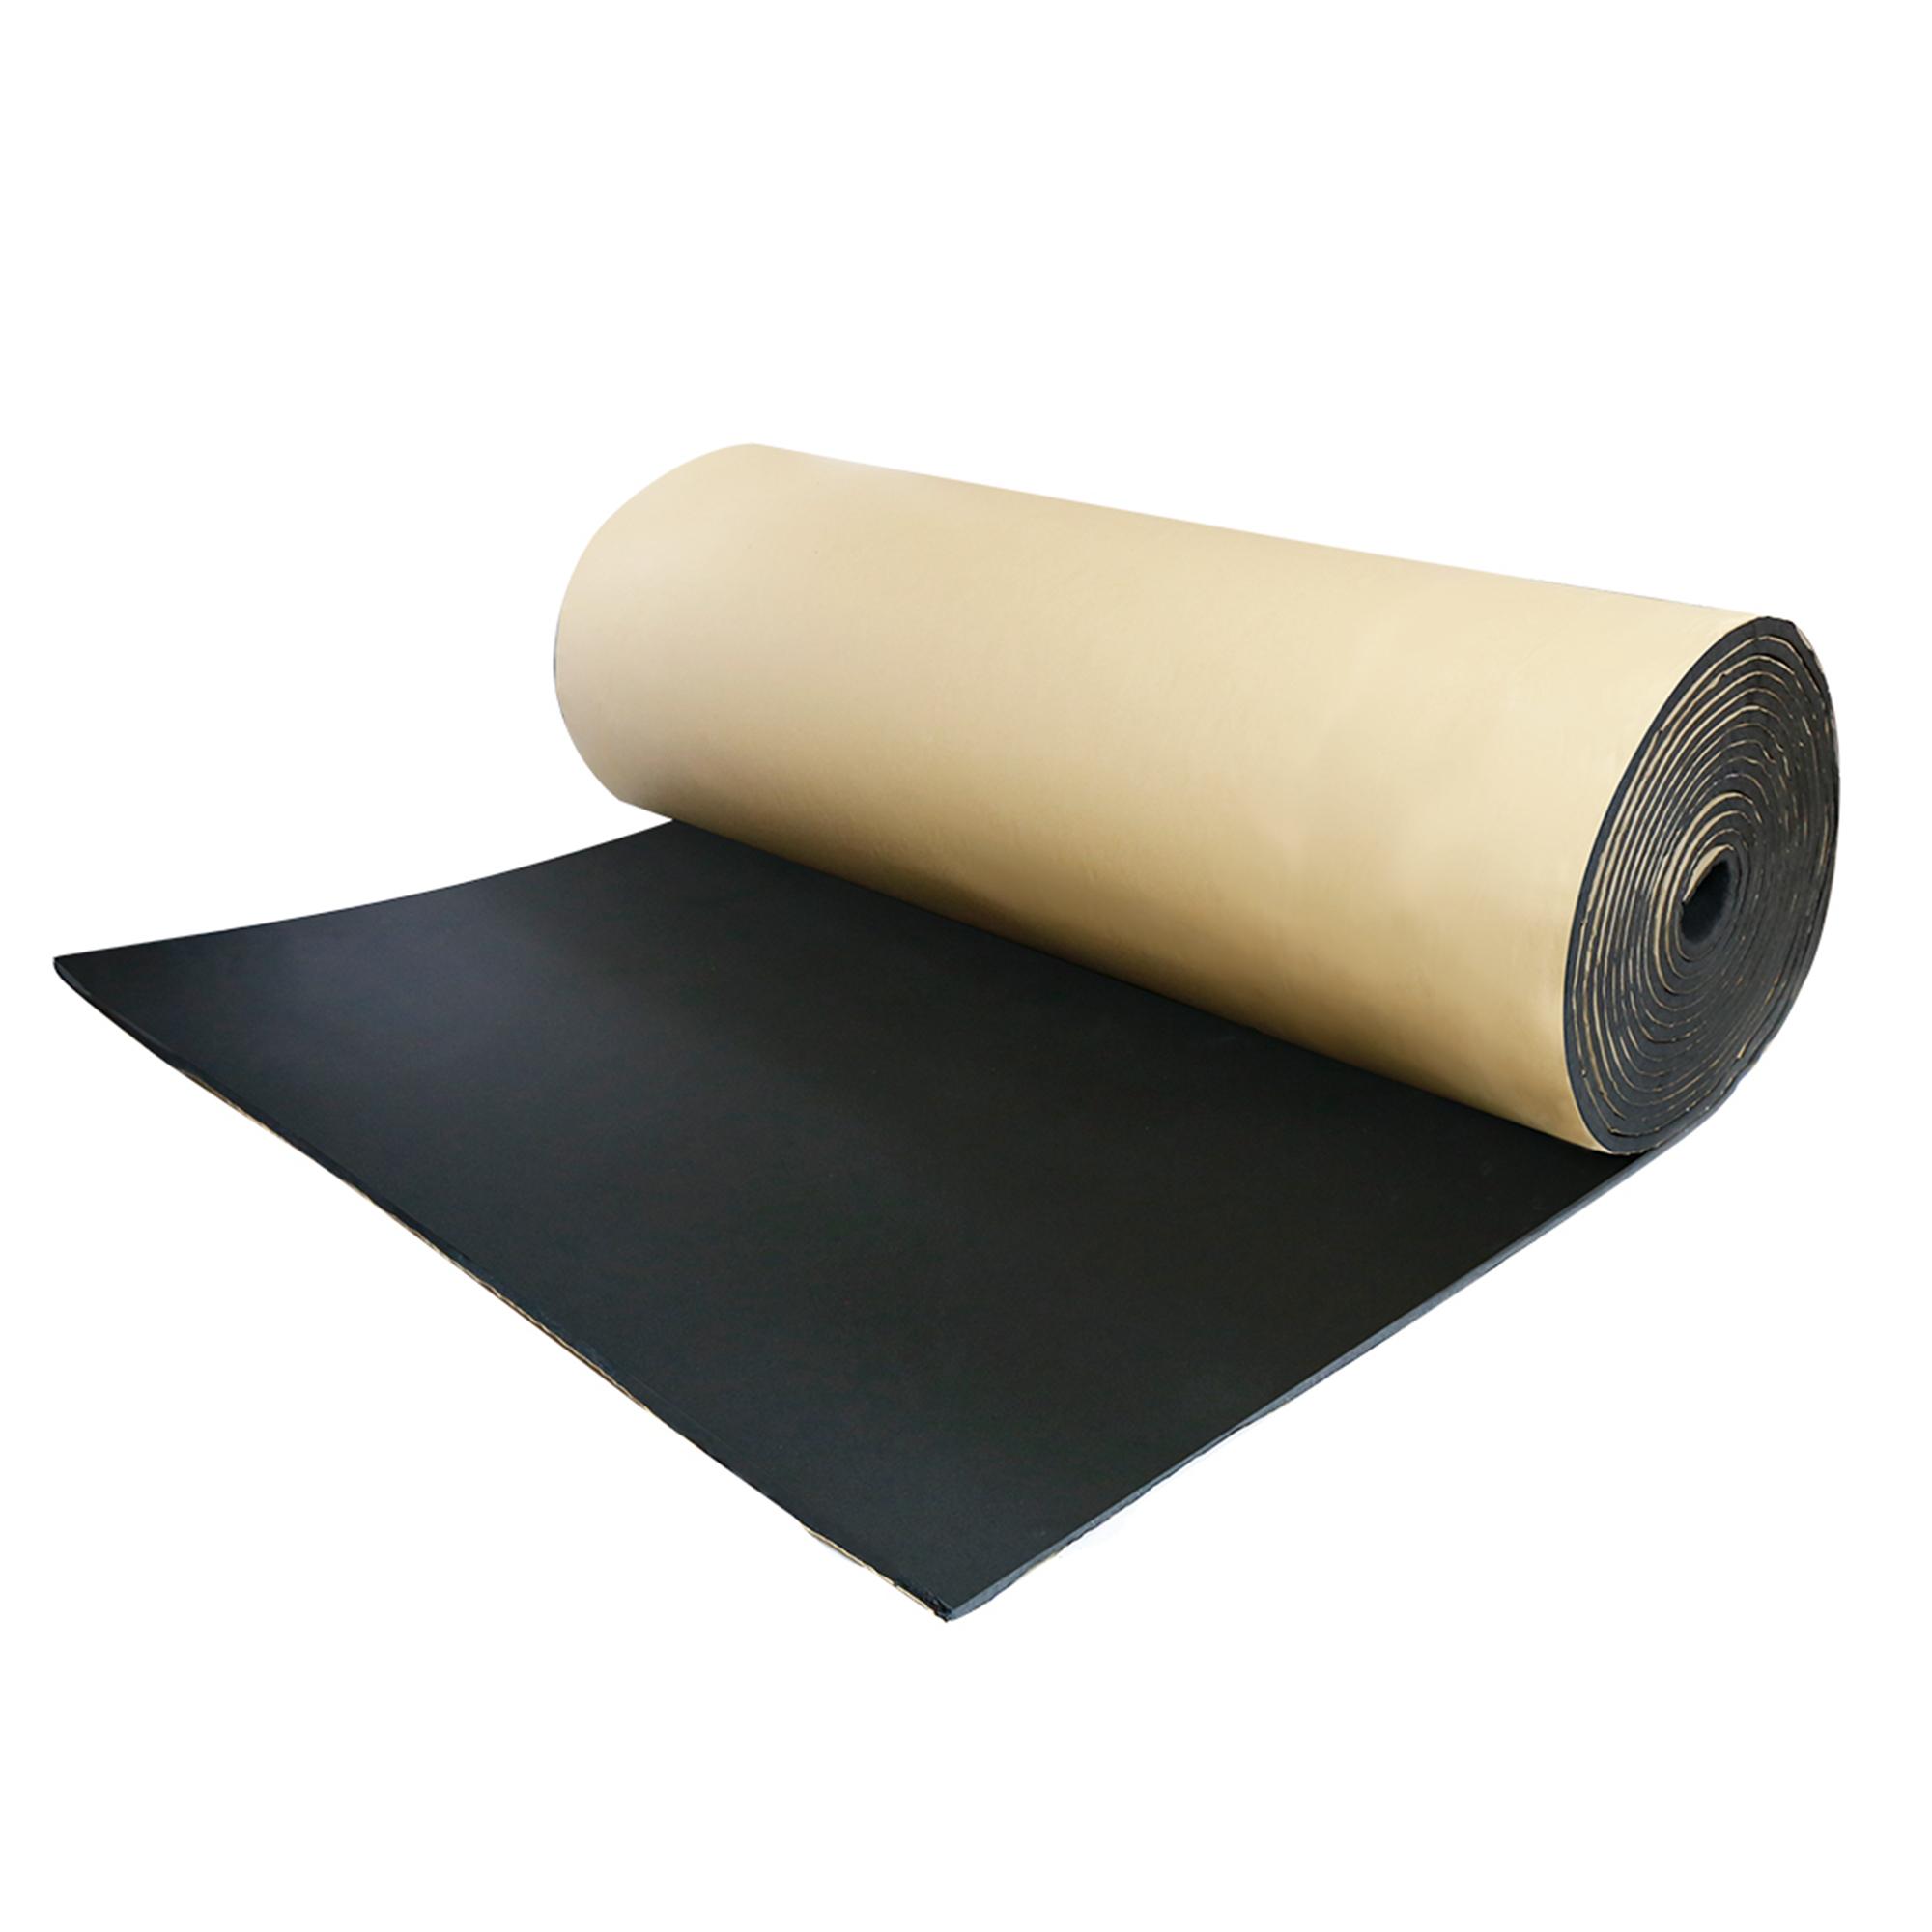 "394mil 10mm 6.46sqft Car Floor Tailgate Sound Insulation Deadener Mat 40""x24"""